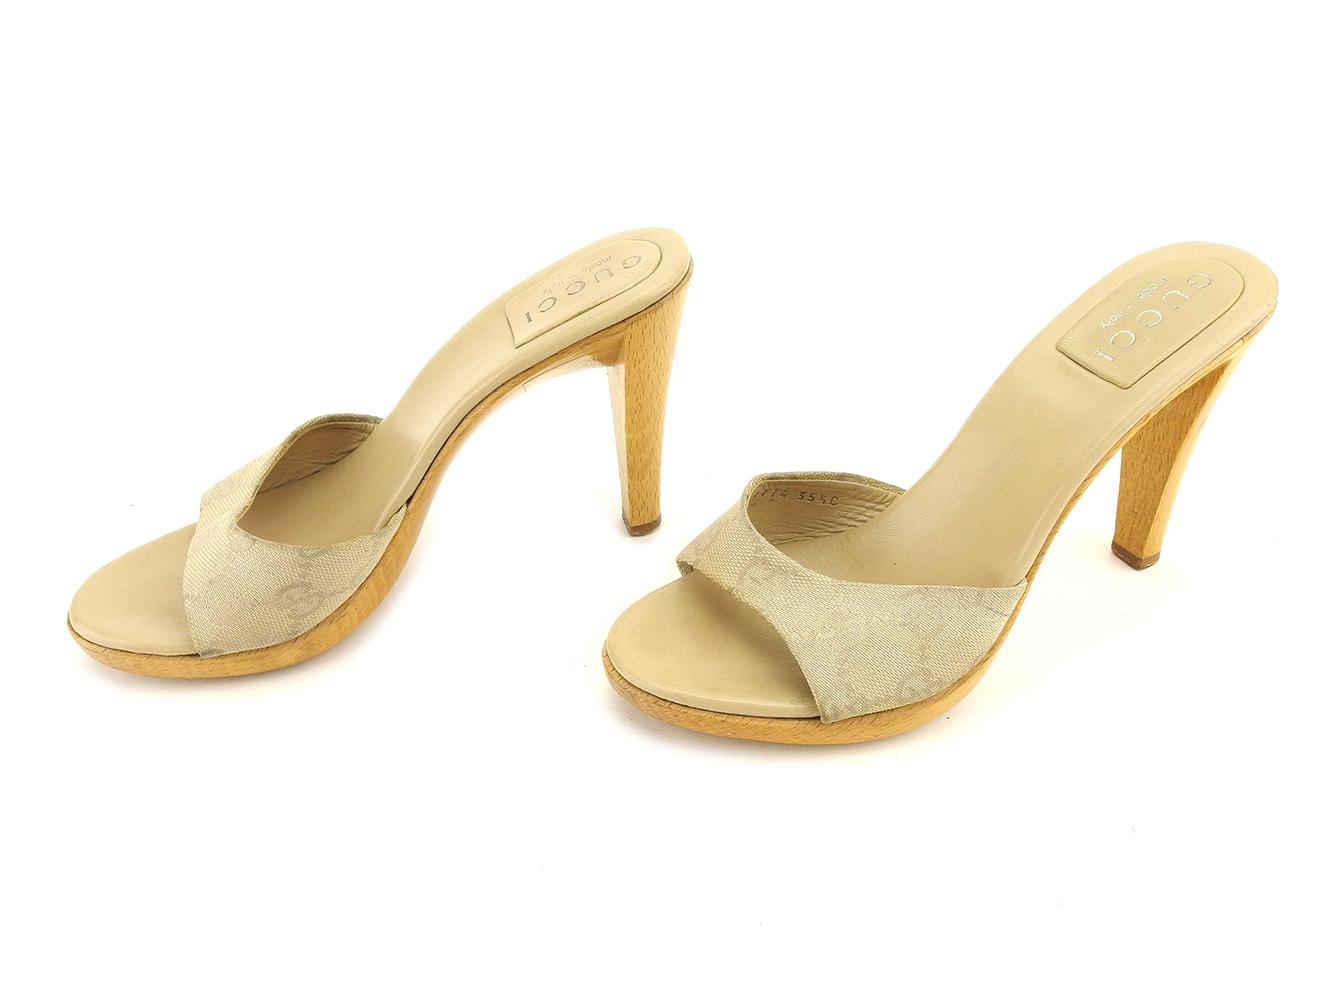 780ae37b BRAND DEPOT: Gucci mule shoes shoes beige T6120s | Rakuten Global Market